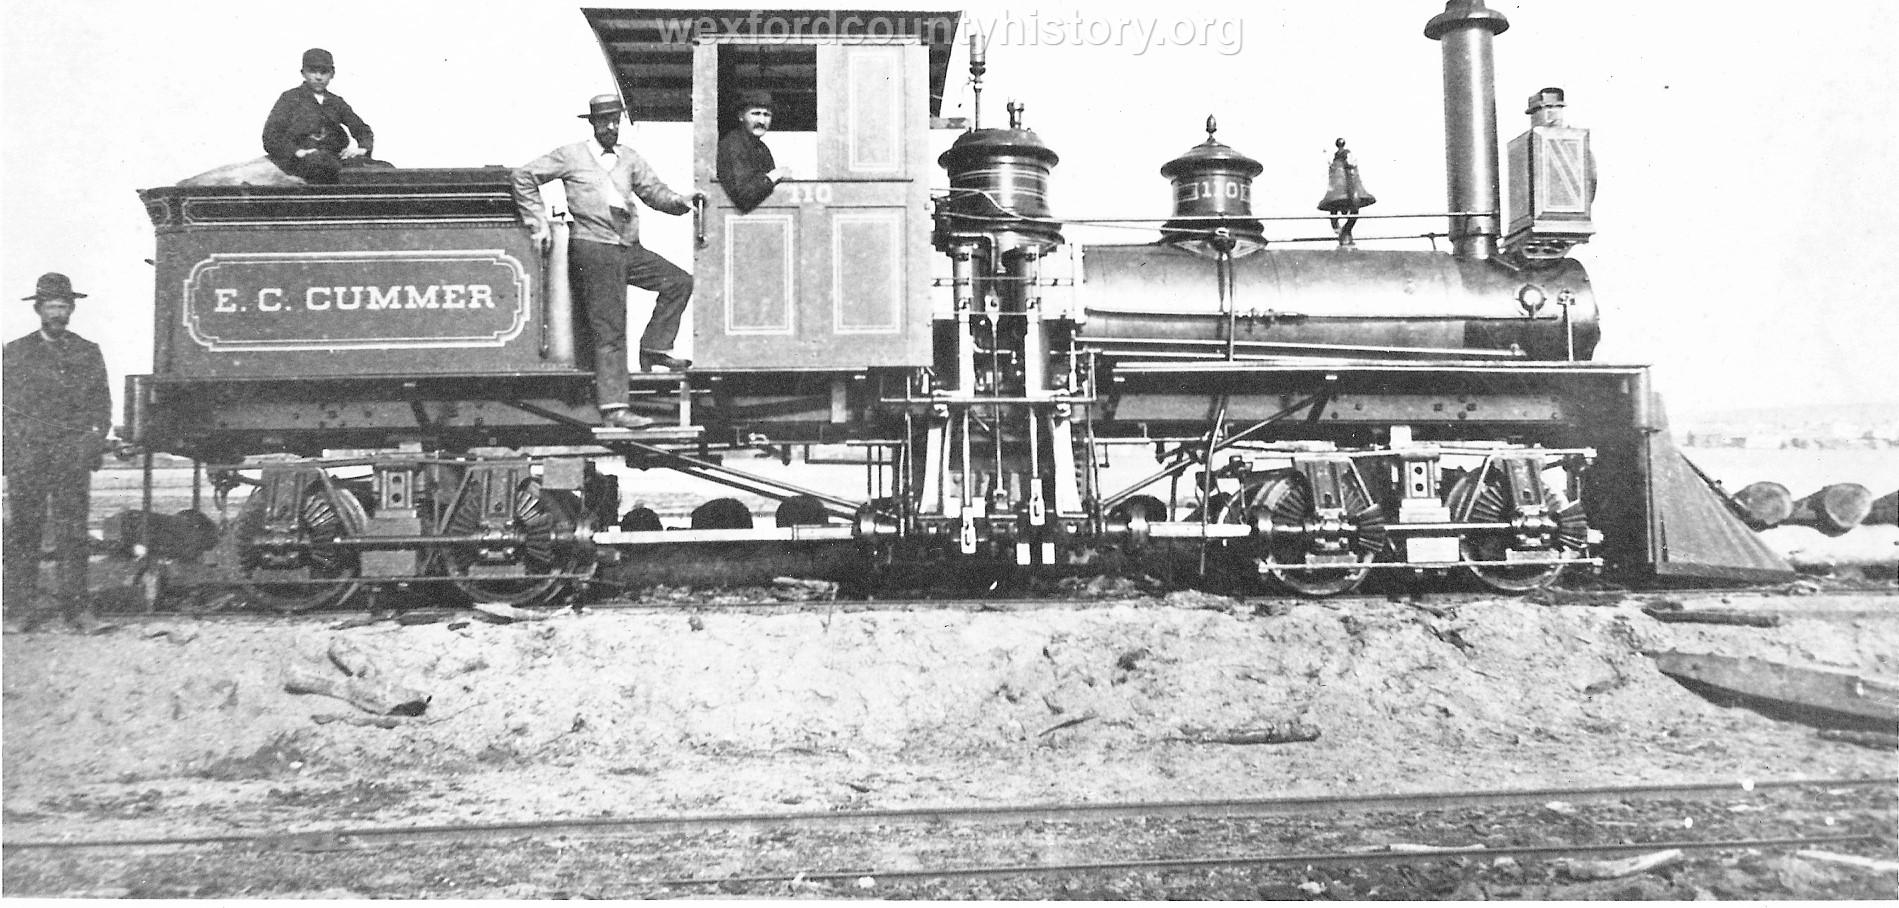 Cadillac-Railroad-Cummer-Company-Shay-TR9ts749